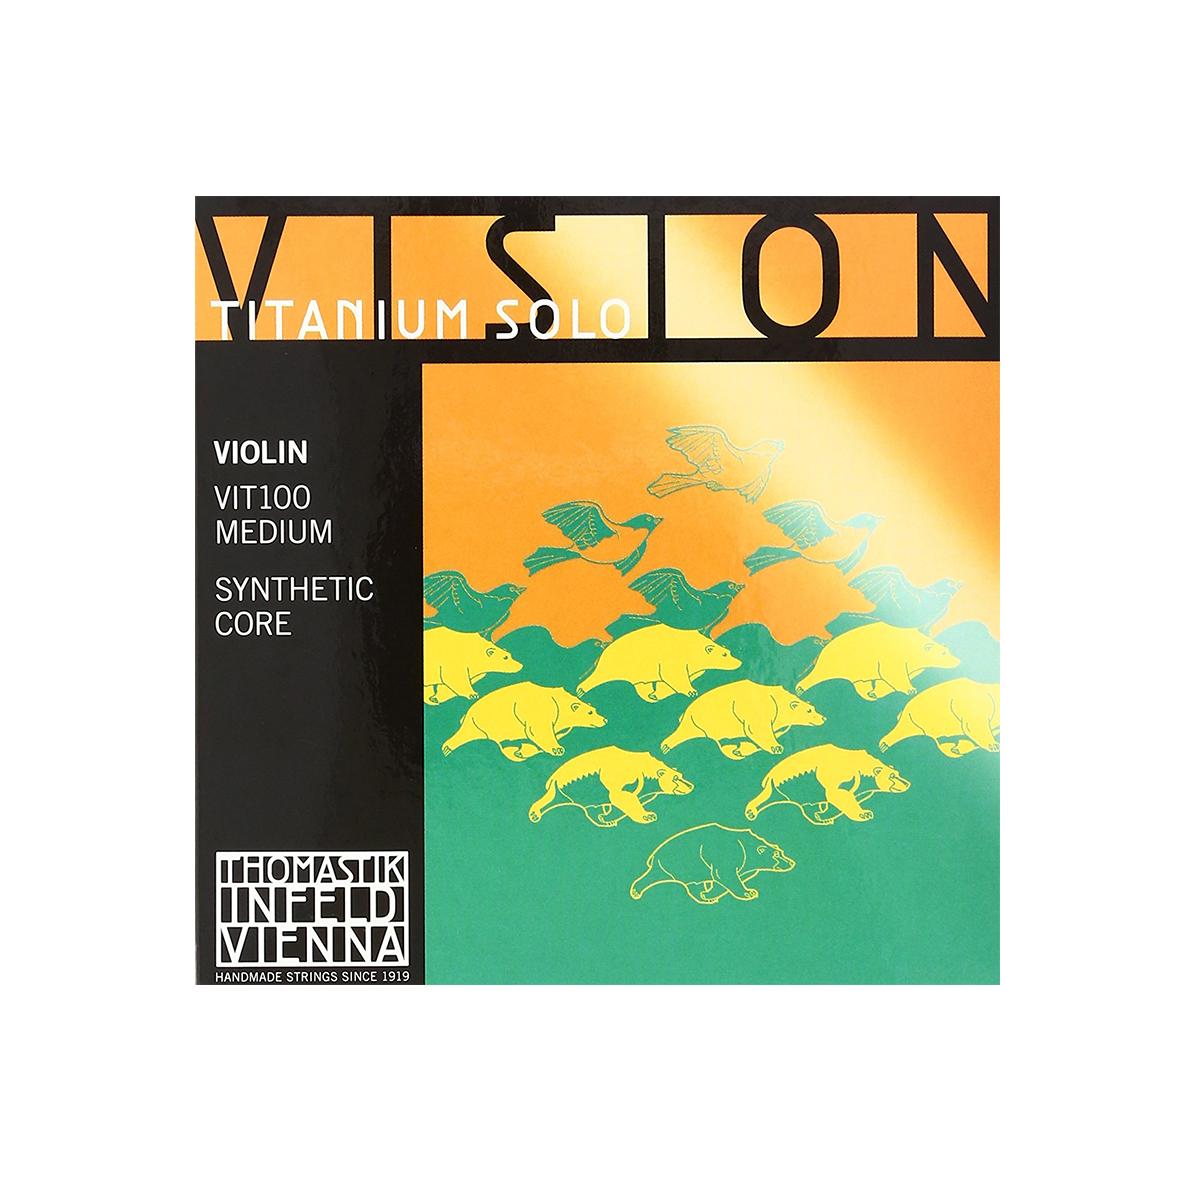 Thomastic Vision Synthetic Core Violin String Set